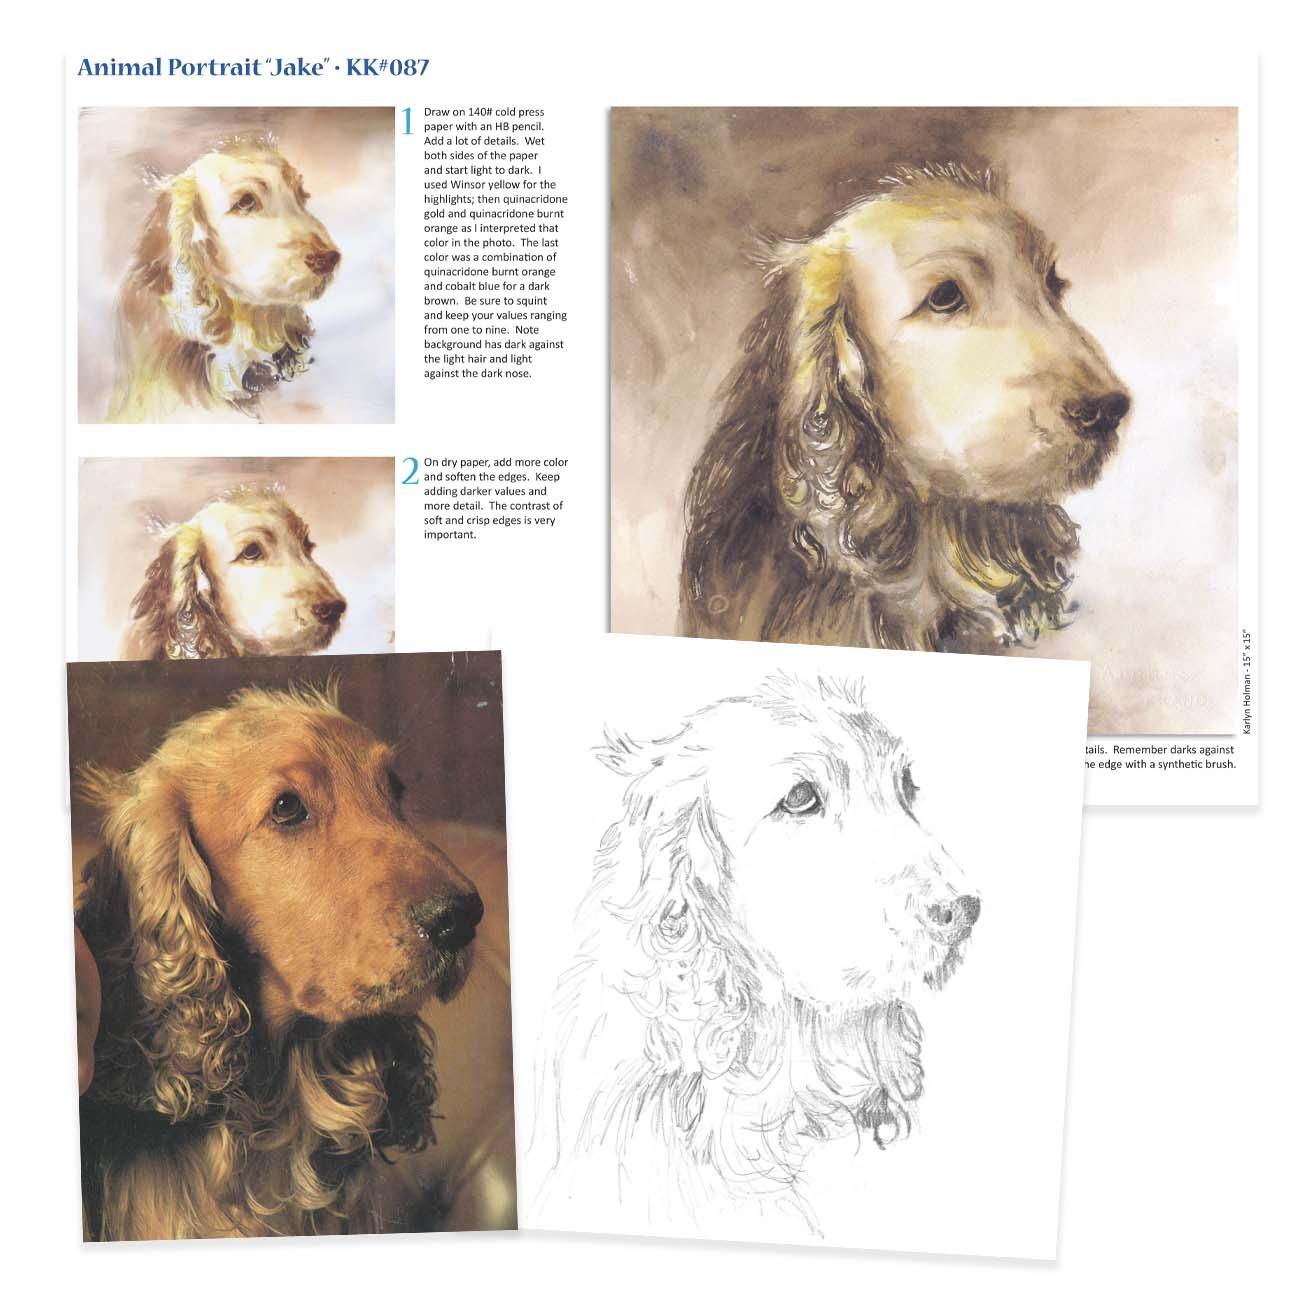 KK087 - Animal Portrait, Jake